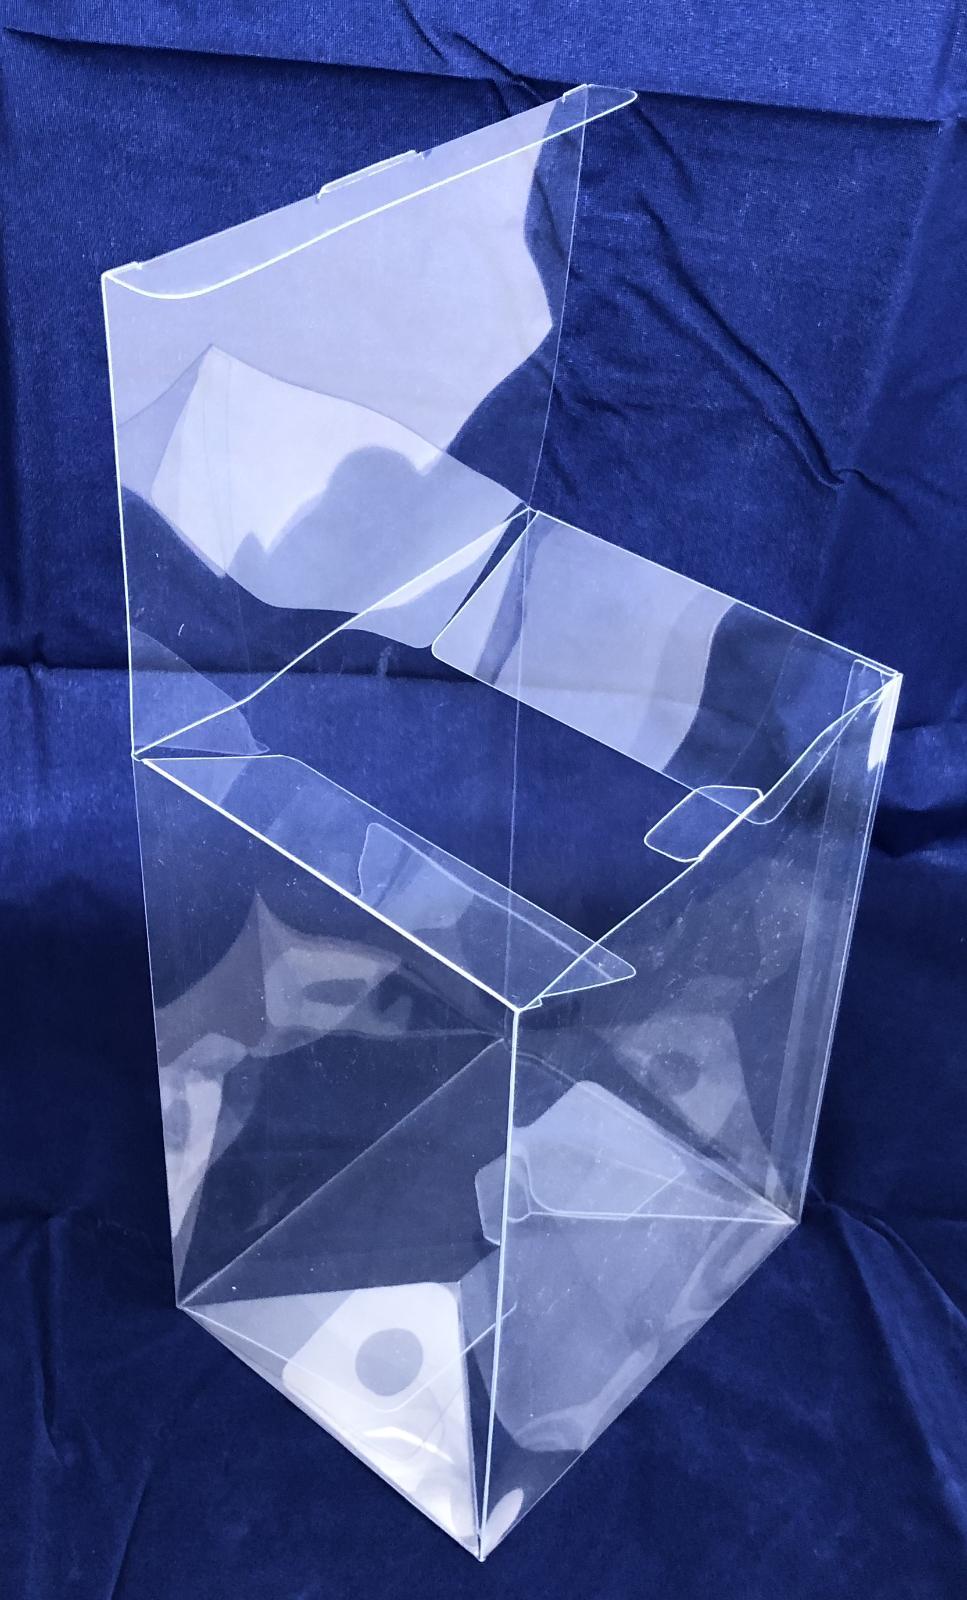 50 Crystal case Figures